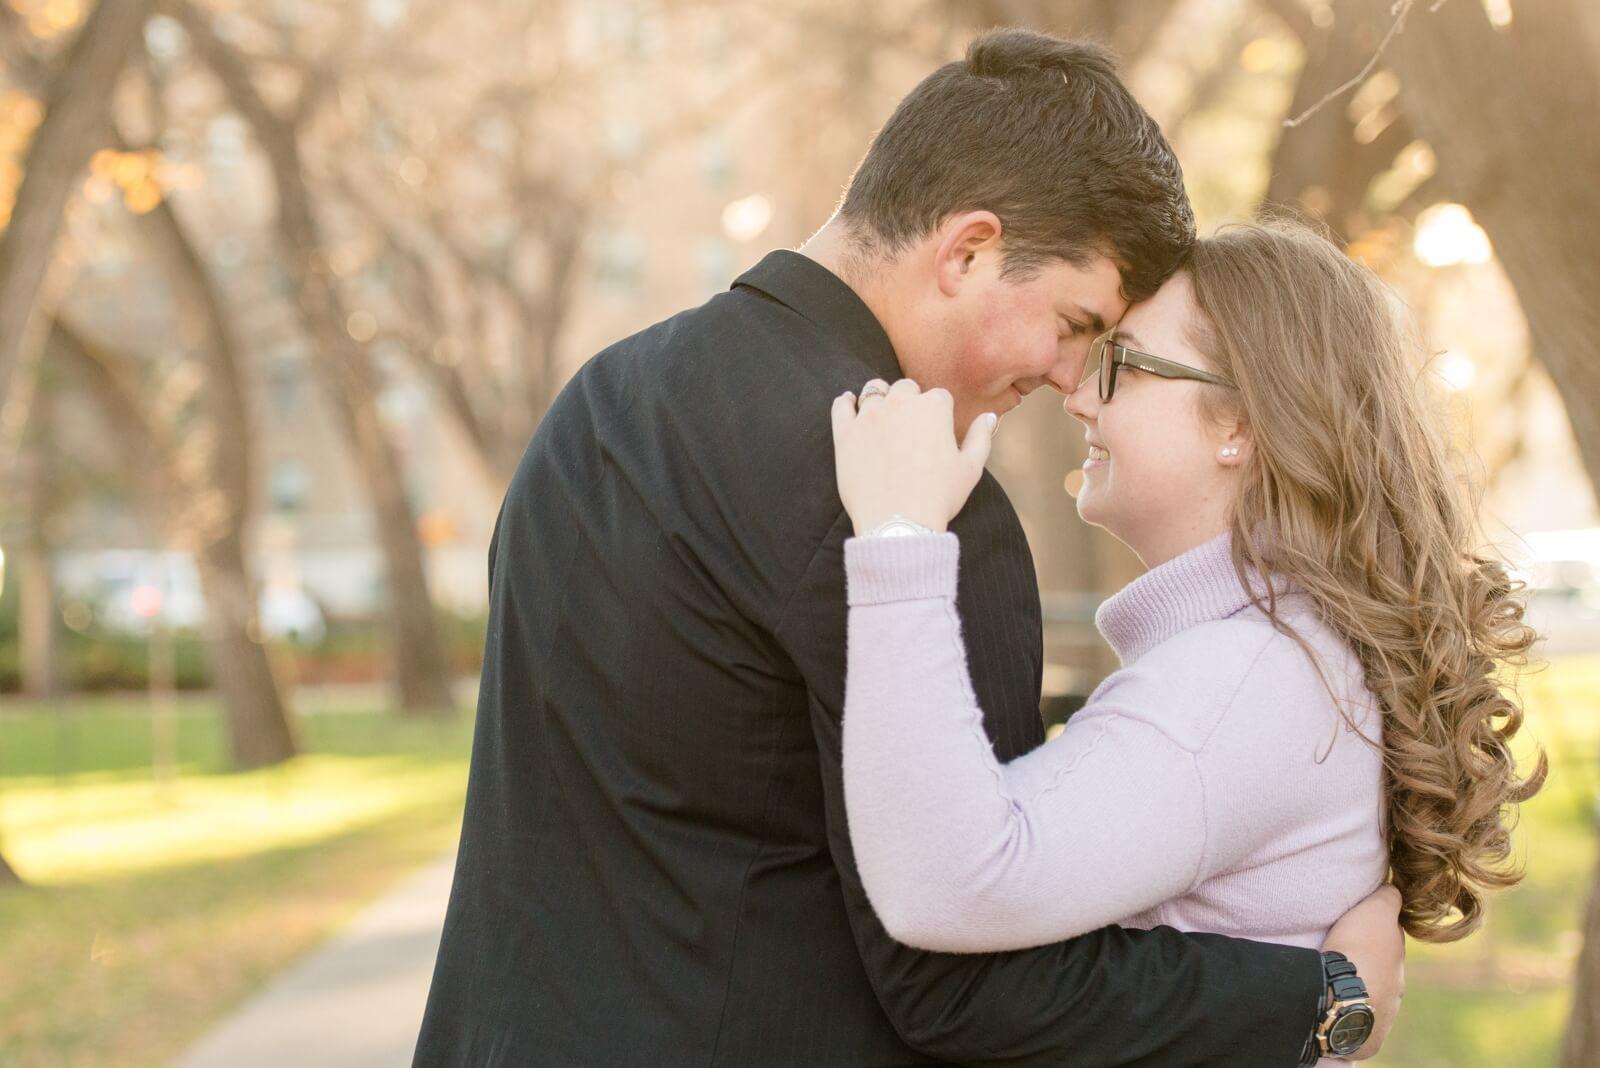 Regina Engagement Photography - Luke-Tori - In the park